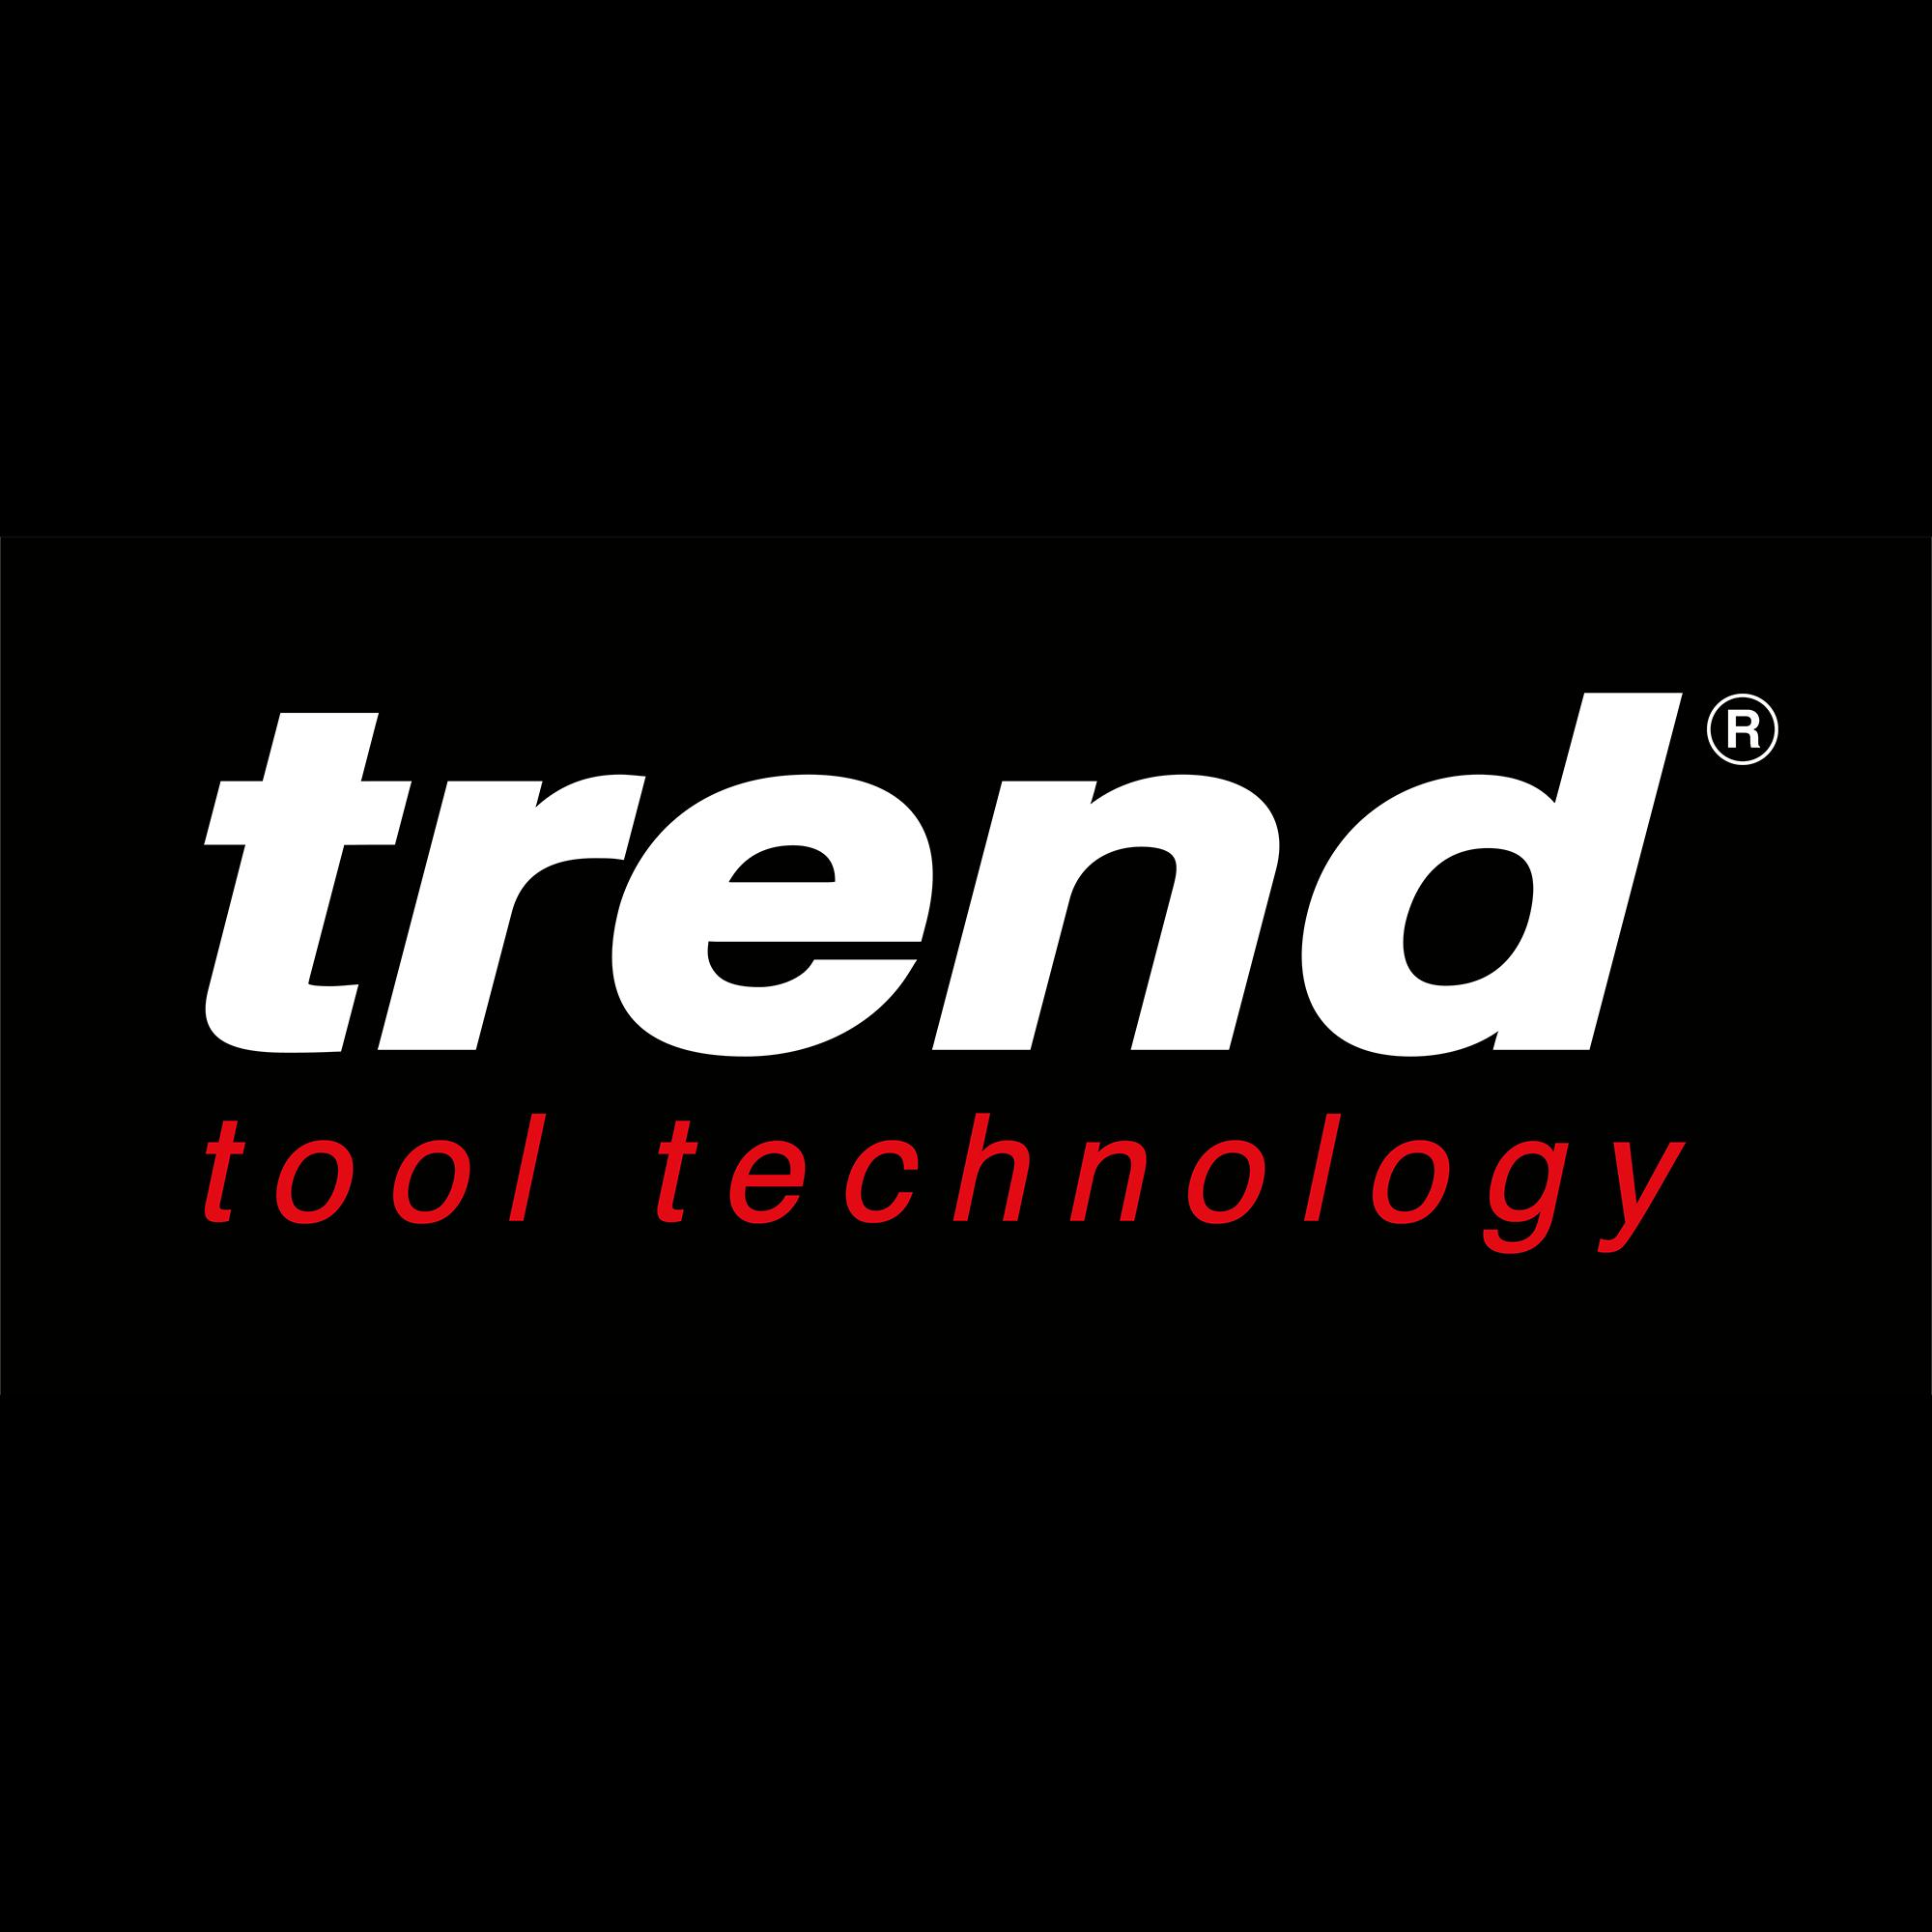 CRT/MK3L - CraftPro Router Table MK3 115V - For UK & Eire sale only